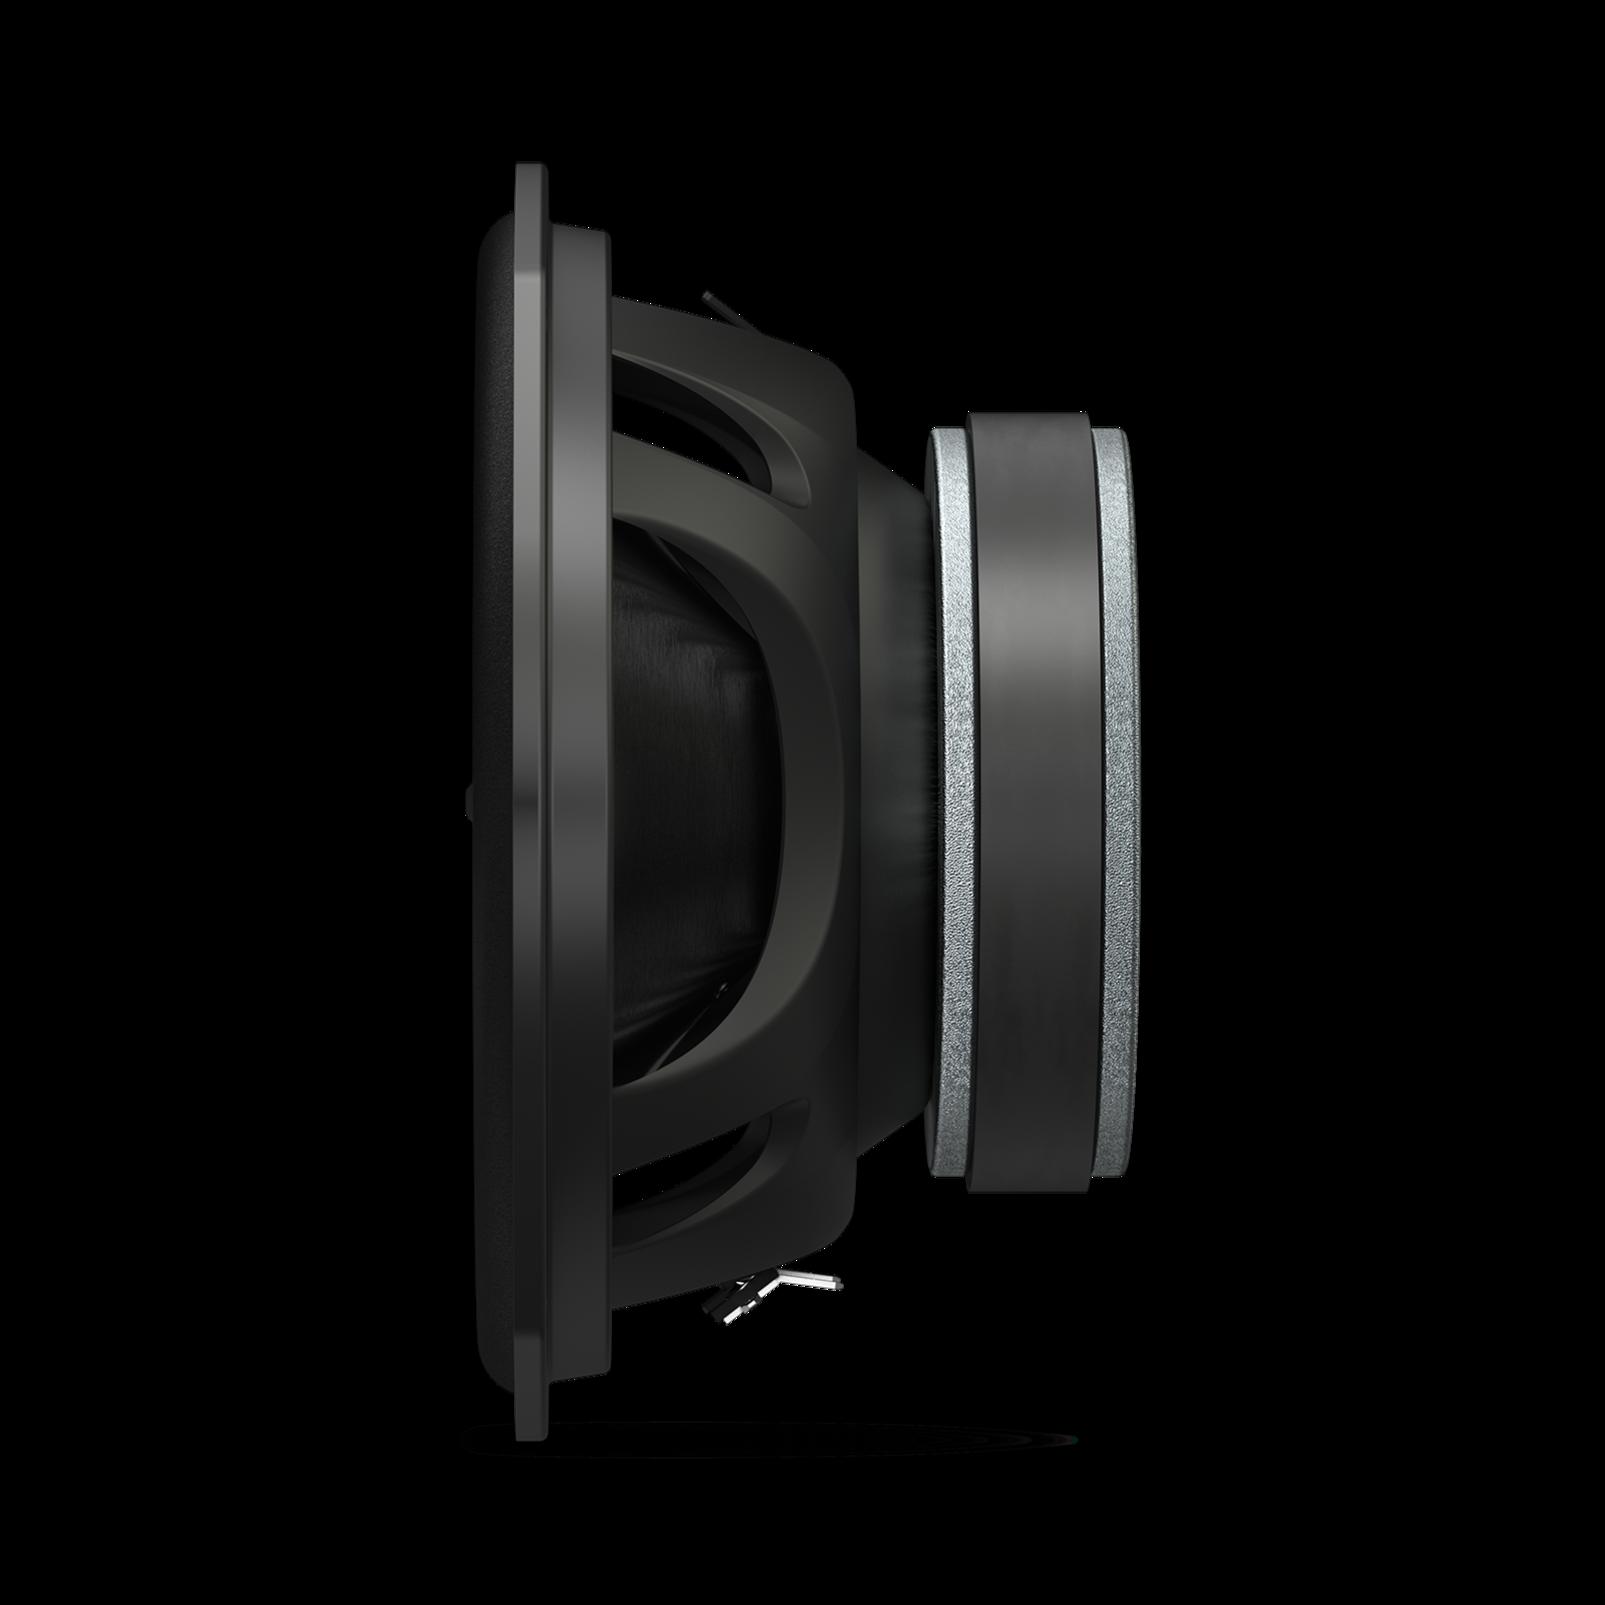 Gx963 6 X 9 Three Way Car Audio Loudspeaker 210w Dodge Ram Infinity Speaker Wiring Front